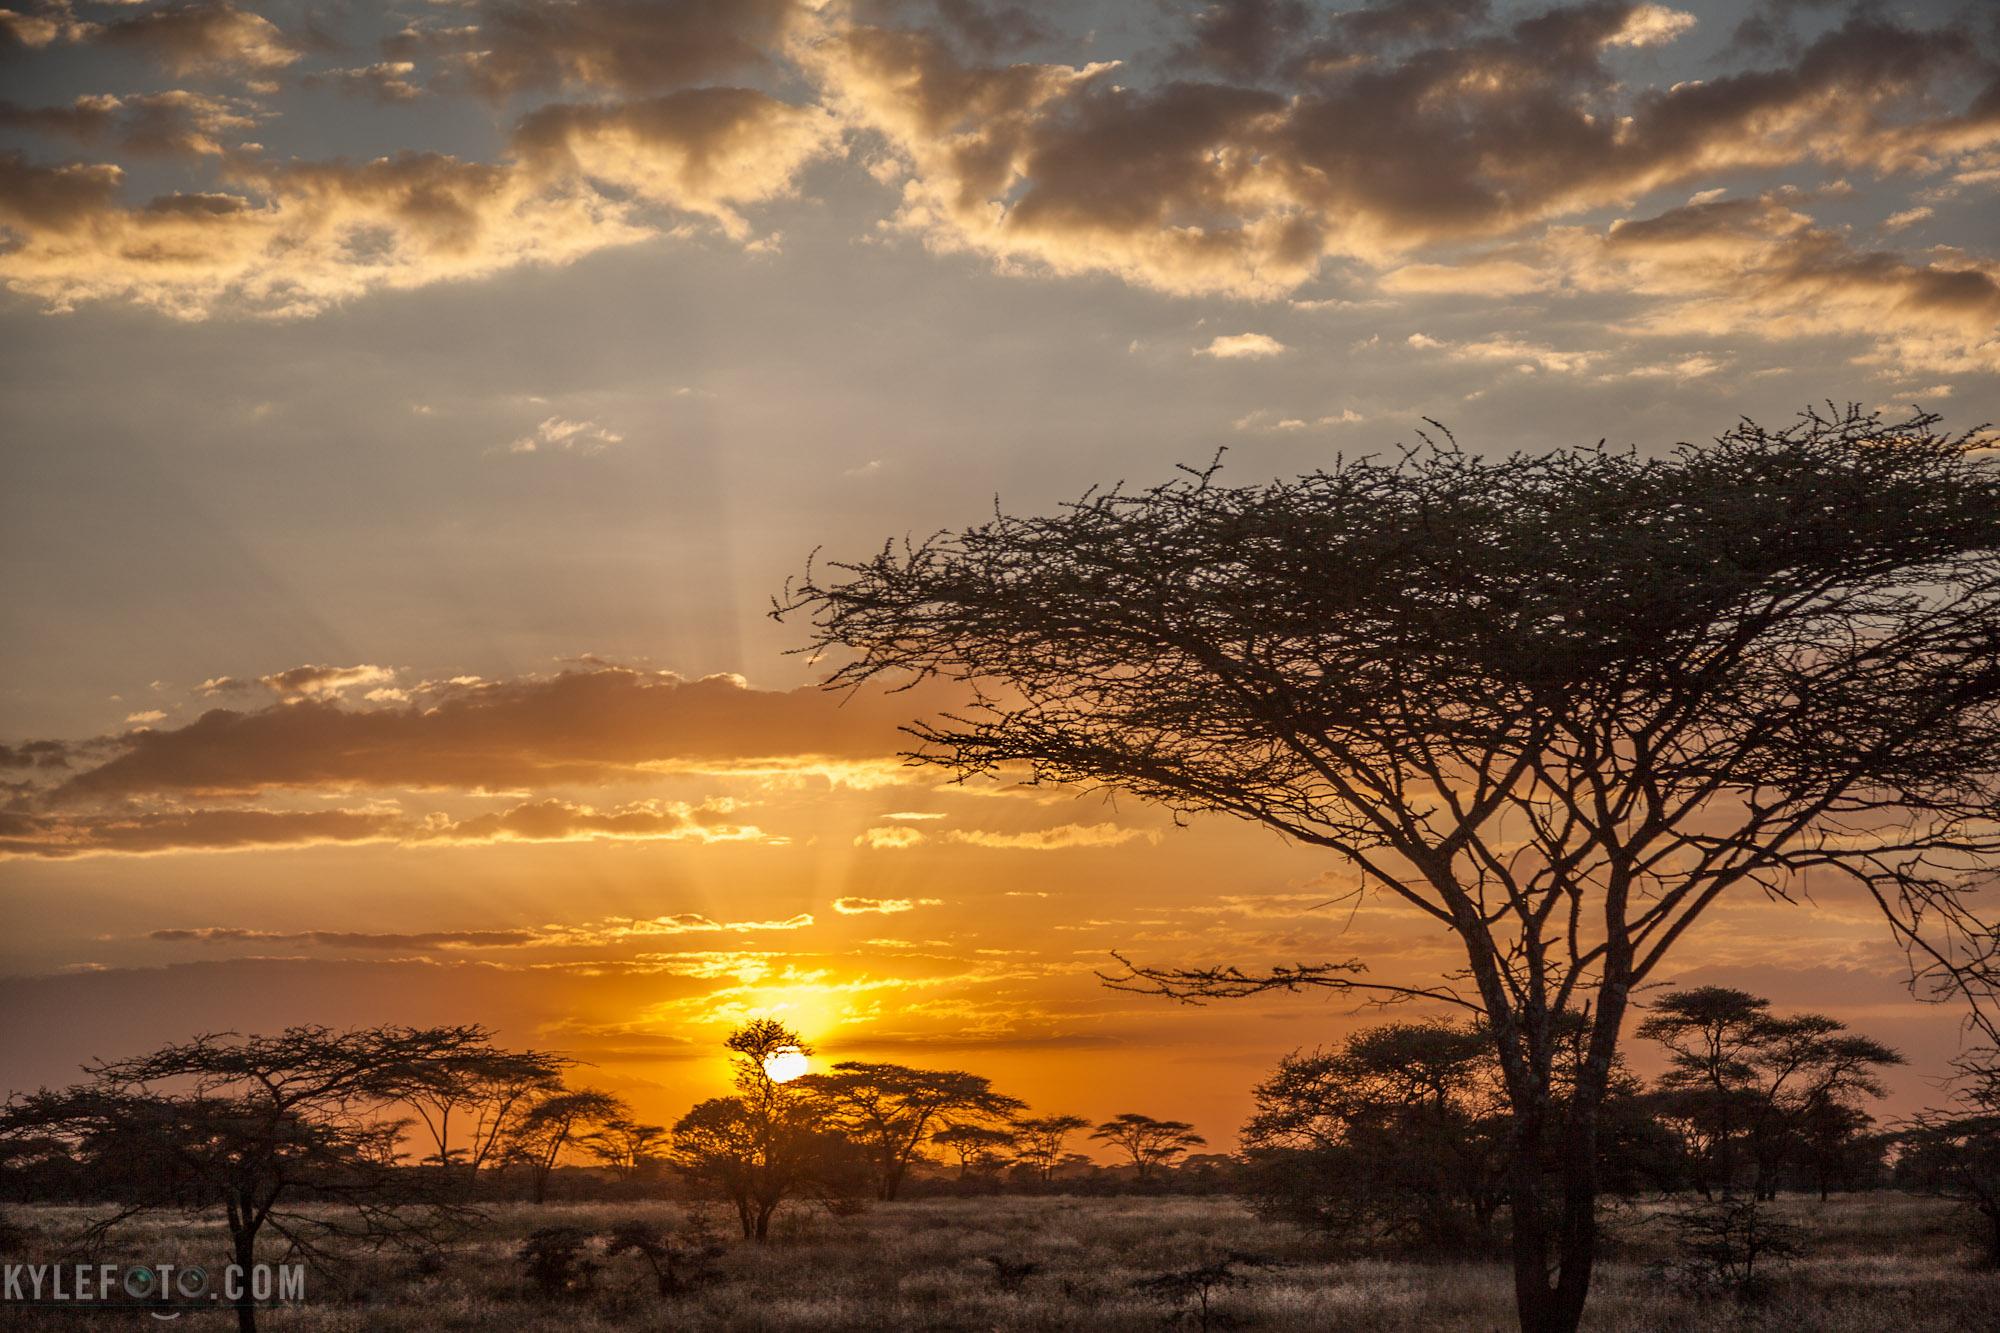 sunset-in-one-shot-1.jpg